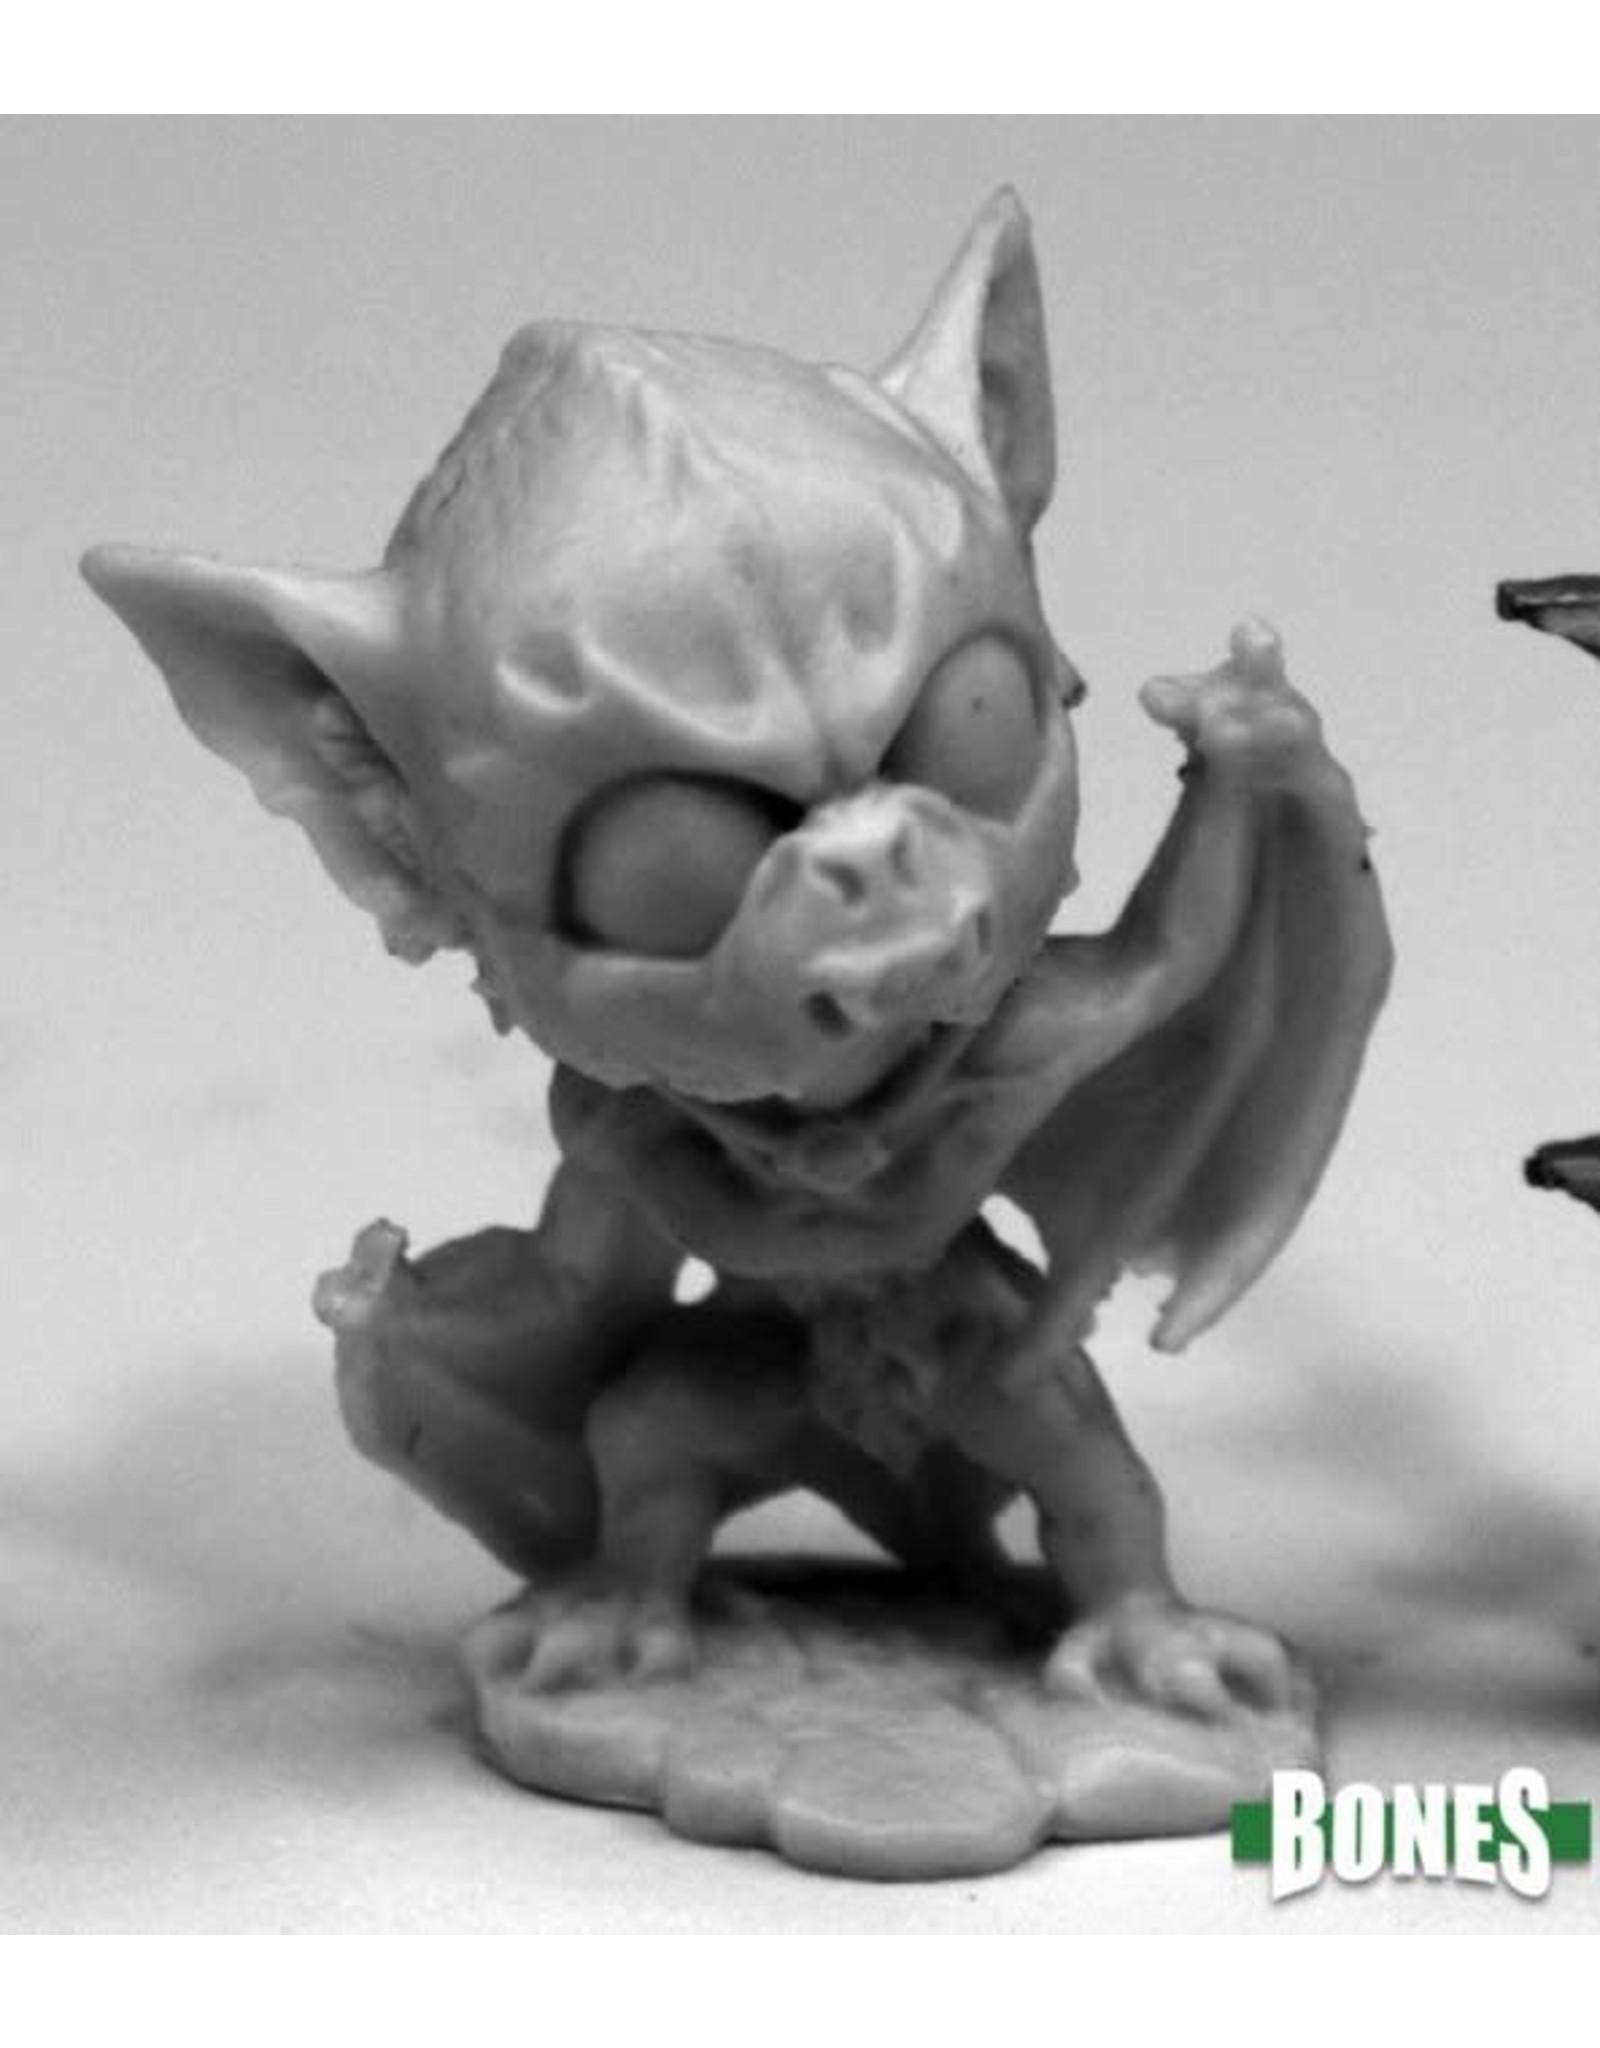 Reaper Miniatures Bones Bonesylvanians - Drak